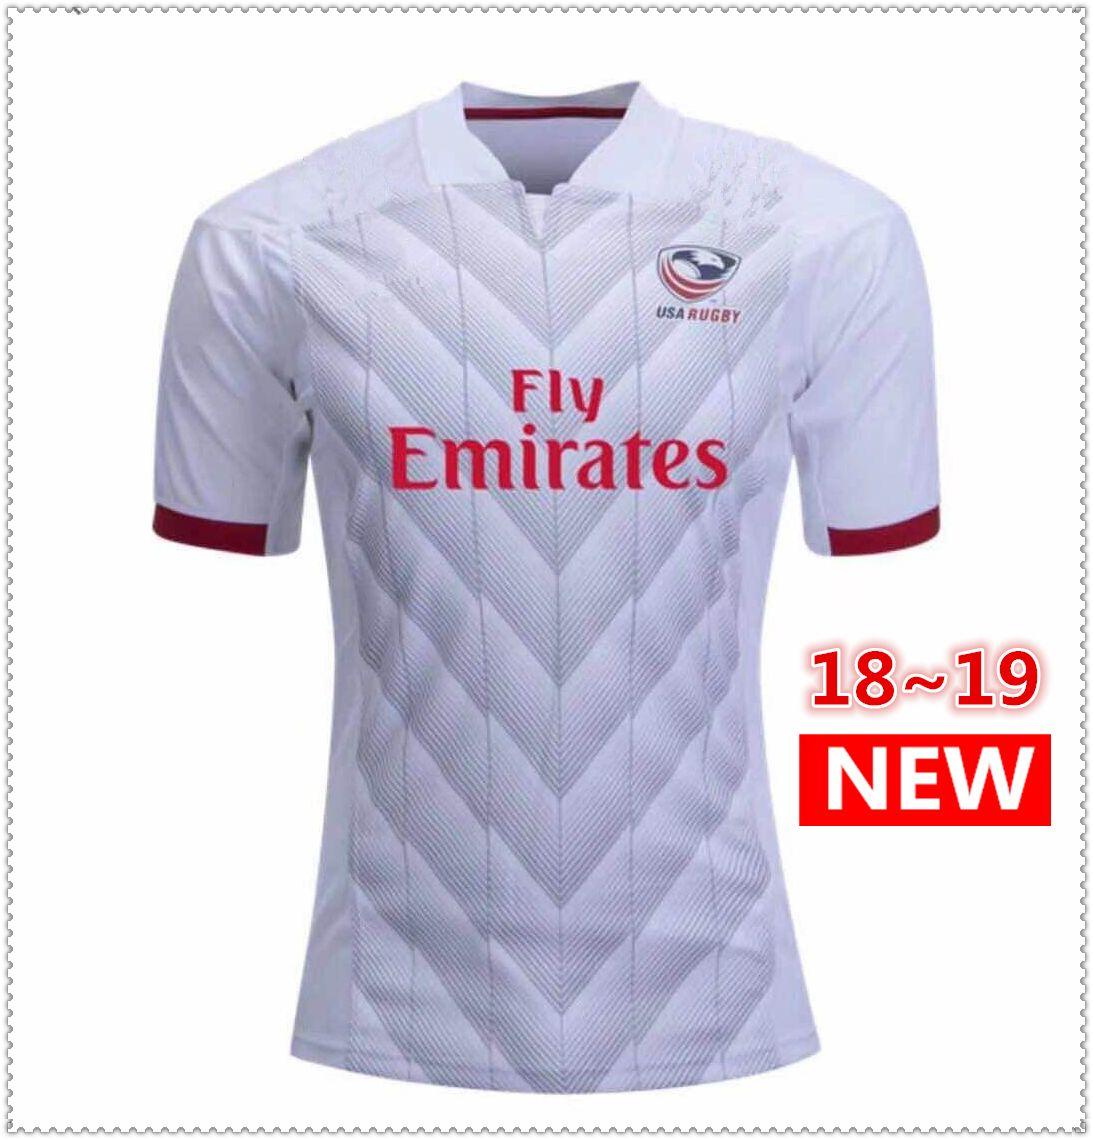 c8a9202697ce0 Compre Ventas Calientes 2018 2019 EE.UU. Estados Unidos Camisetas De Rugby  NRL Liga Nacional De Rugby USA Rugby Para Hombre Camisetas Tamaño S 3XL A   17.26 ...